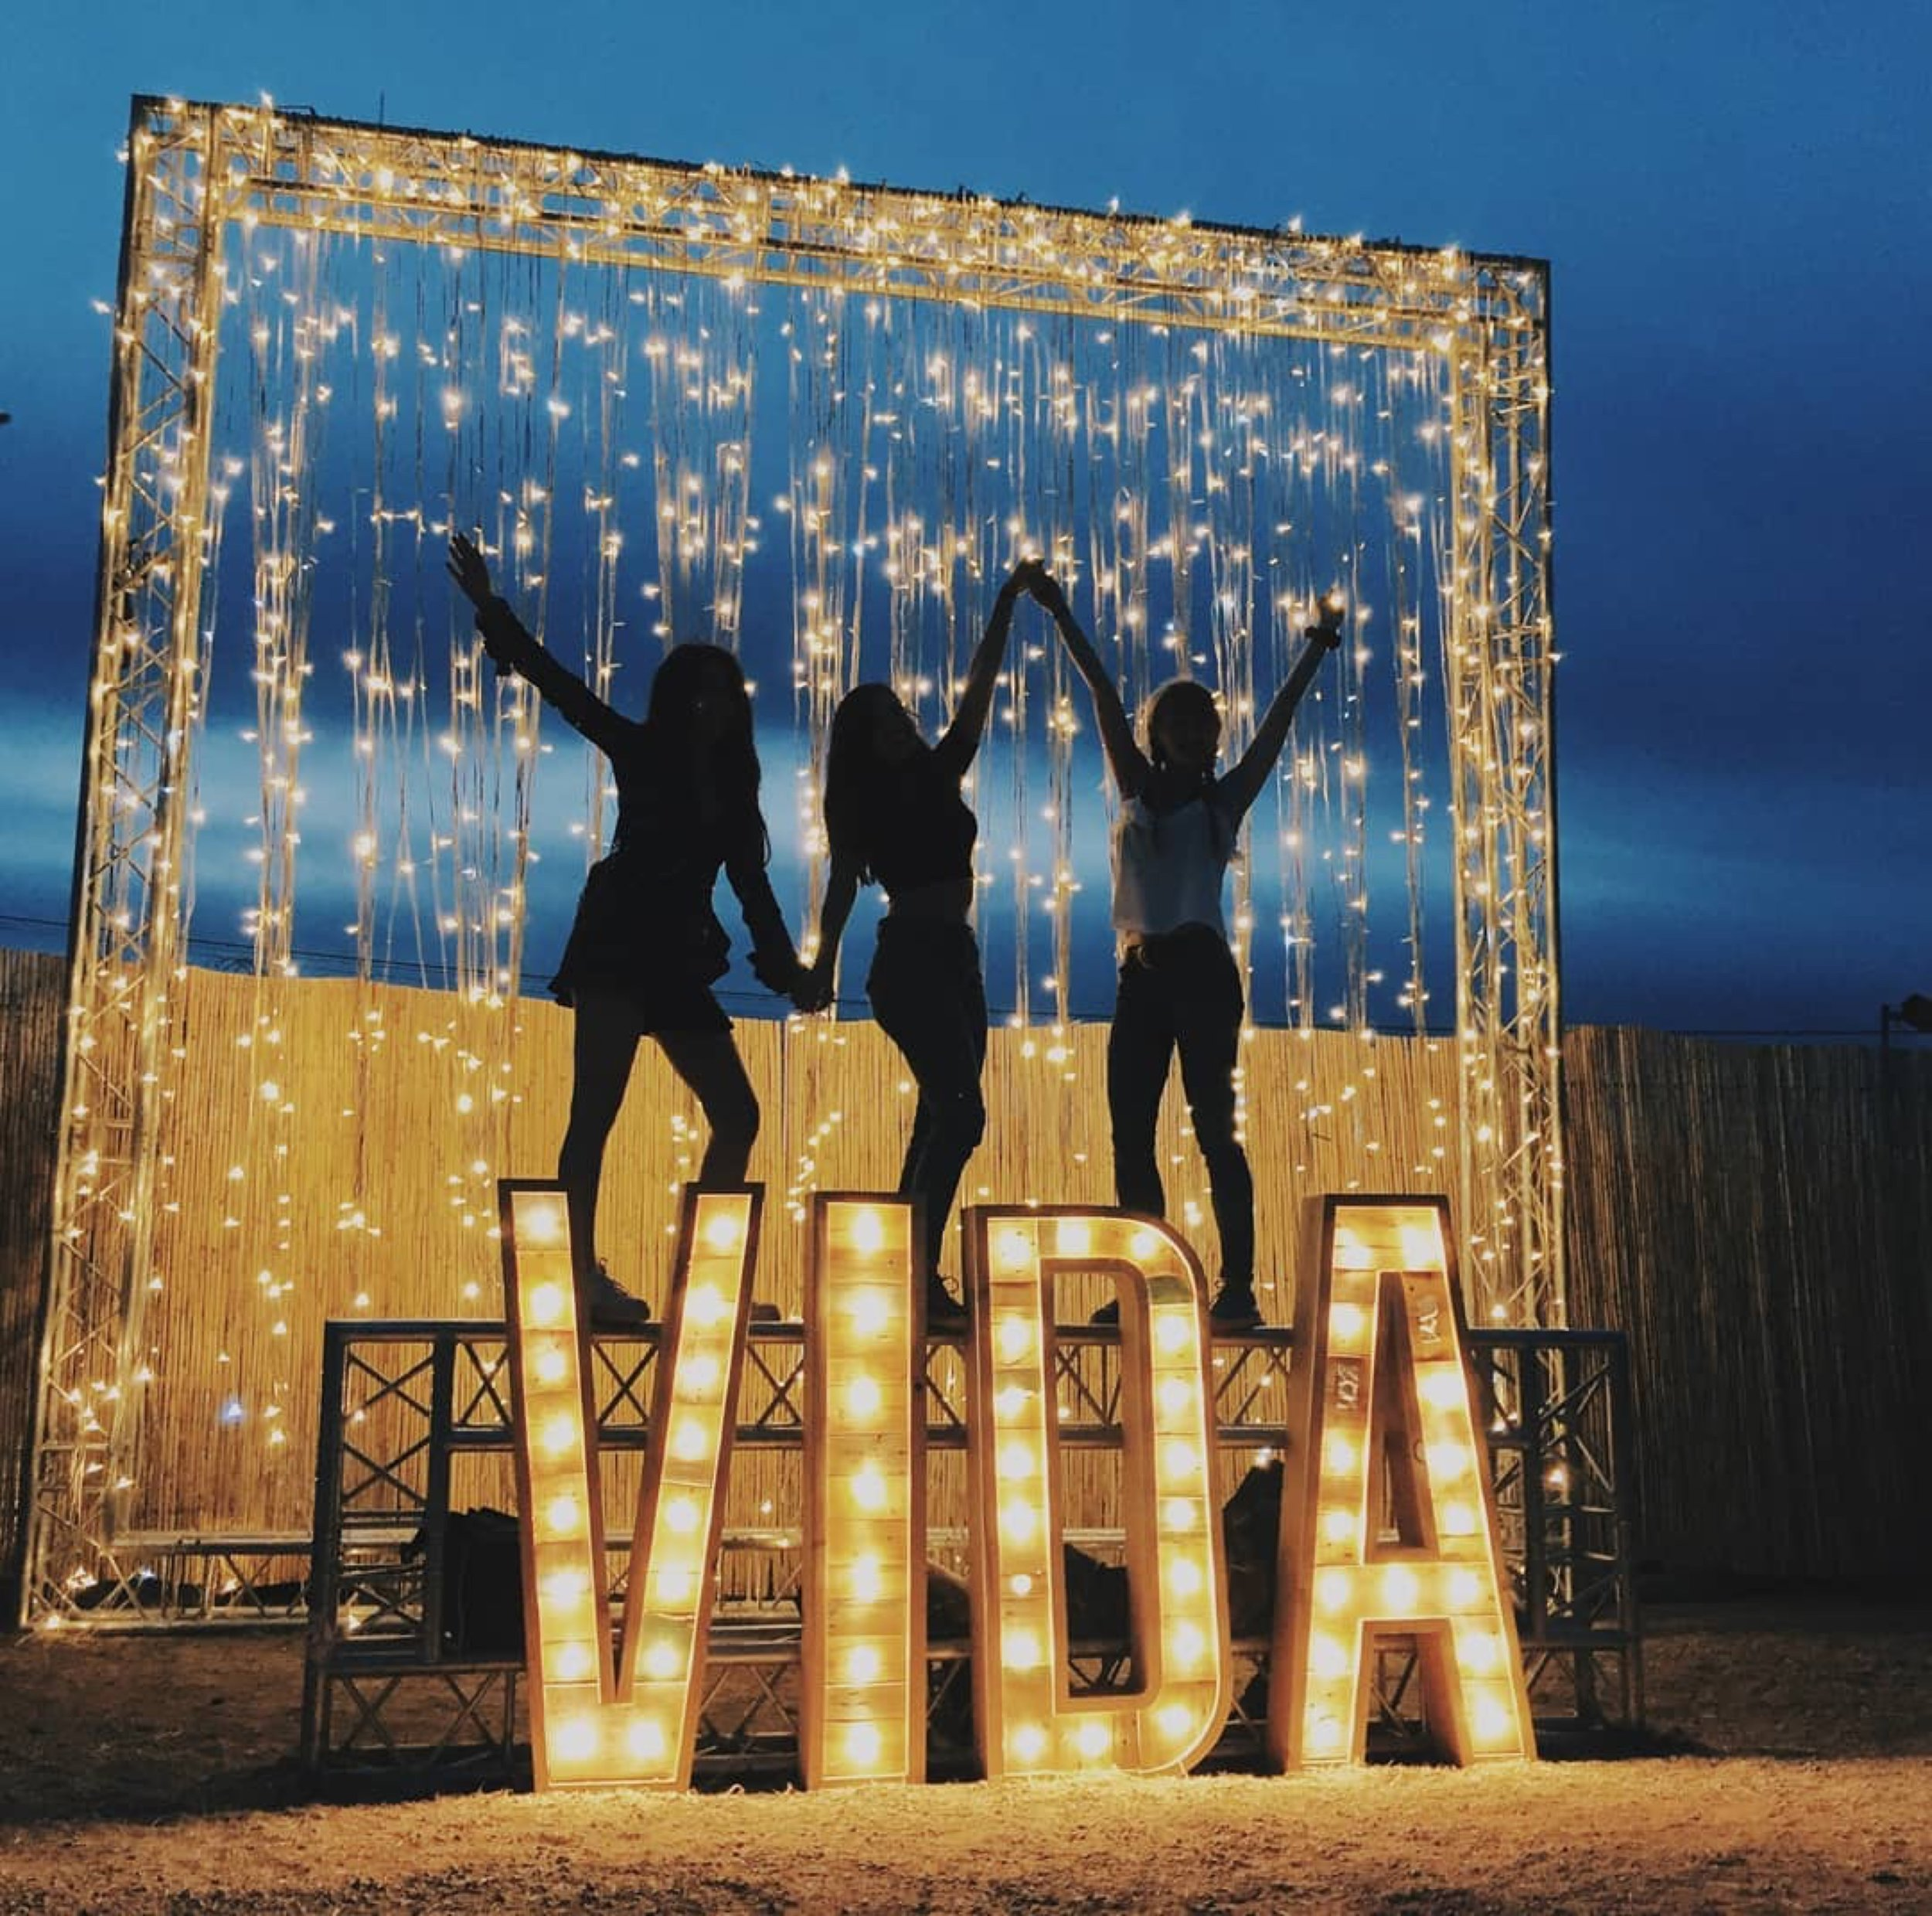 alquiler-vida-festivales-2019-27lletres.jpeg